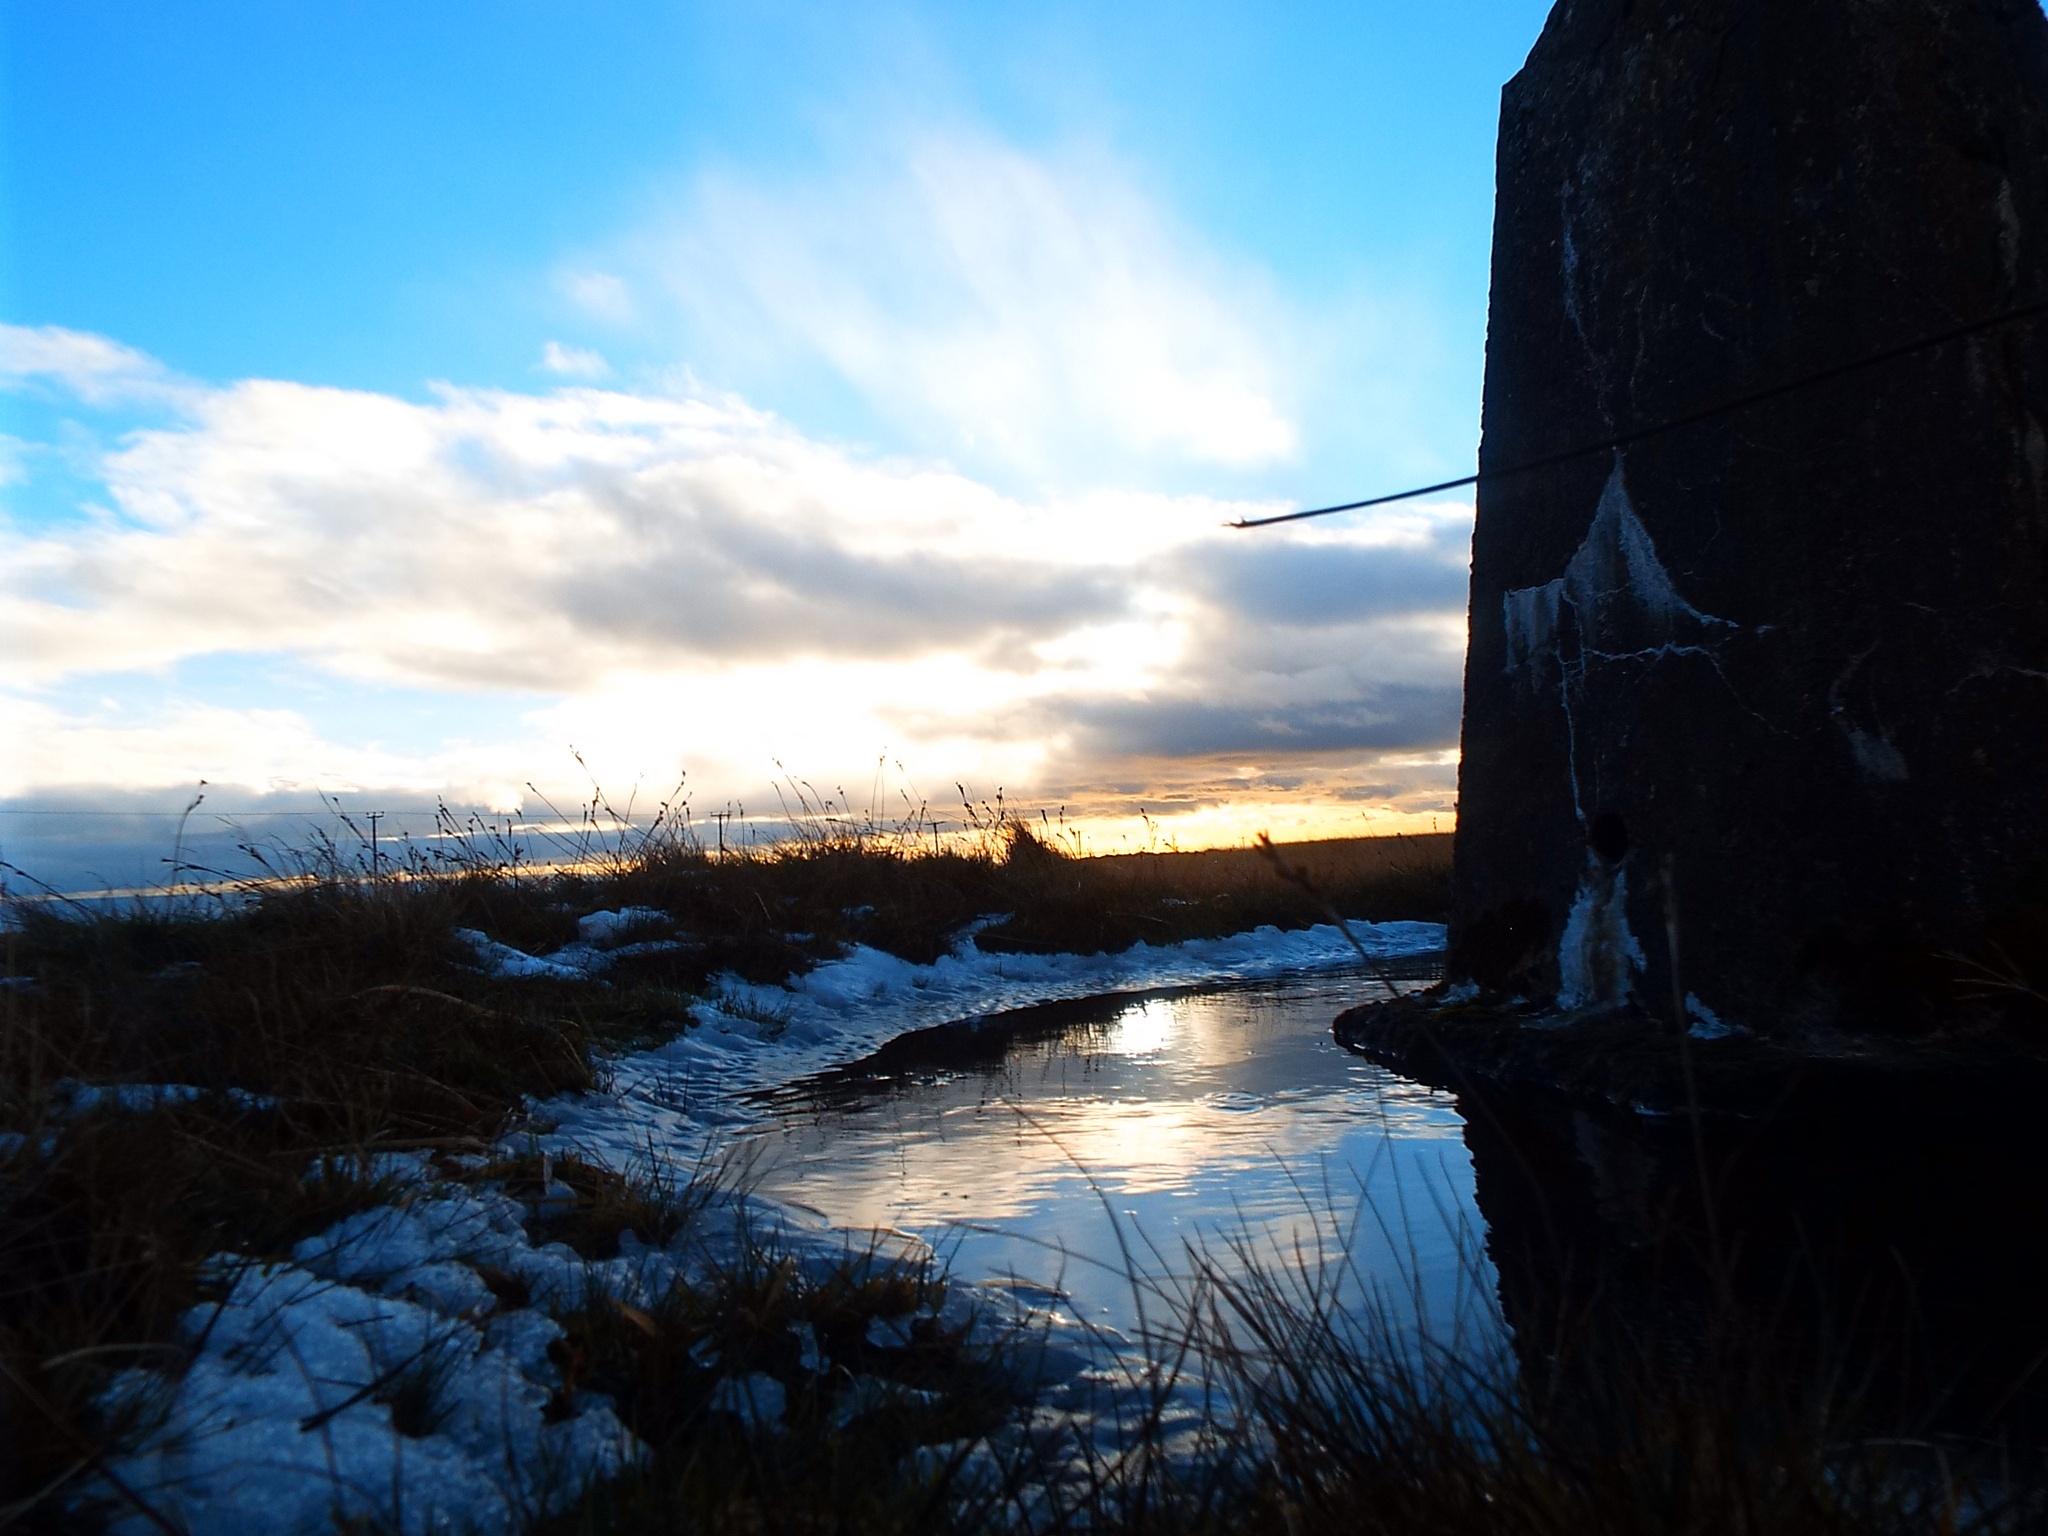 Cold Mountain Monolith by nicholas.john1